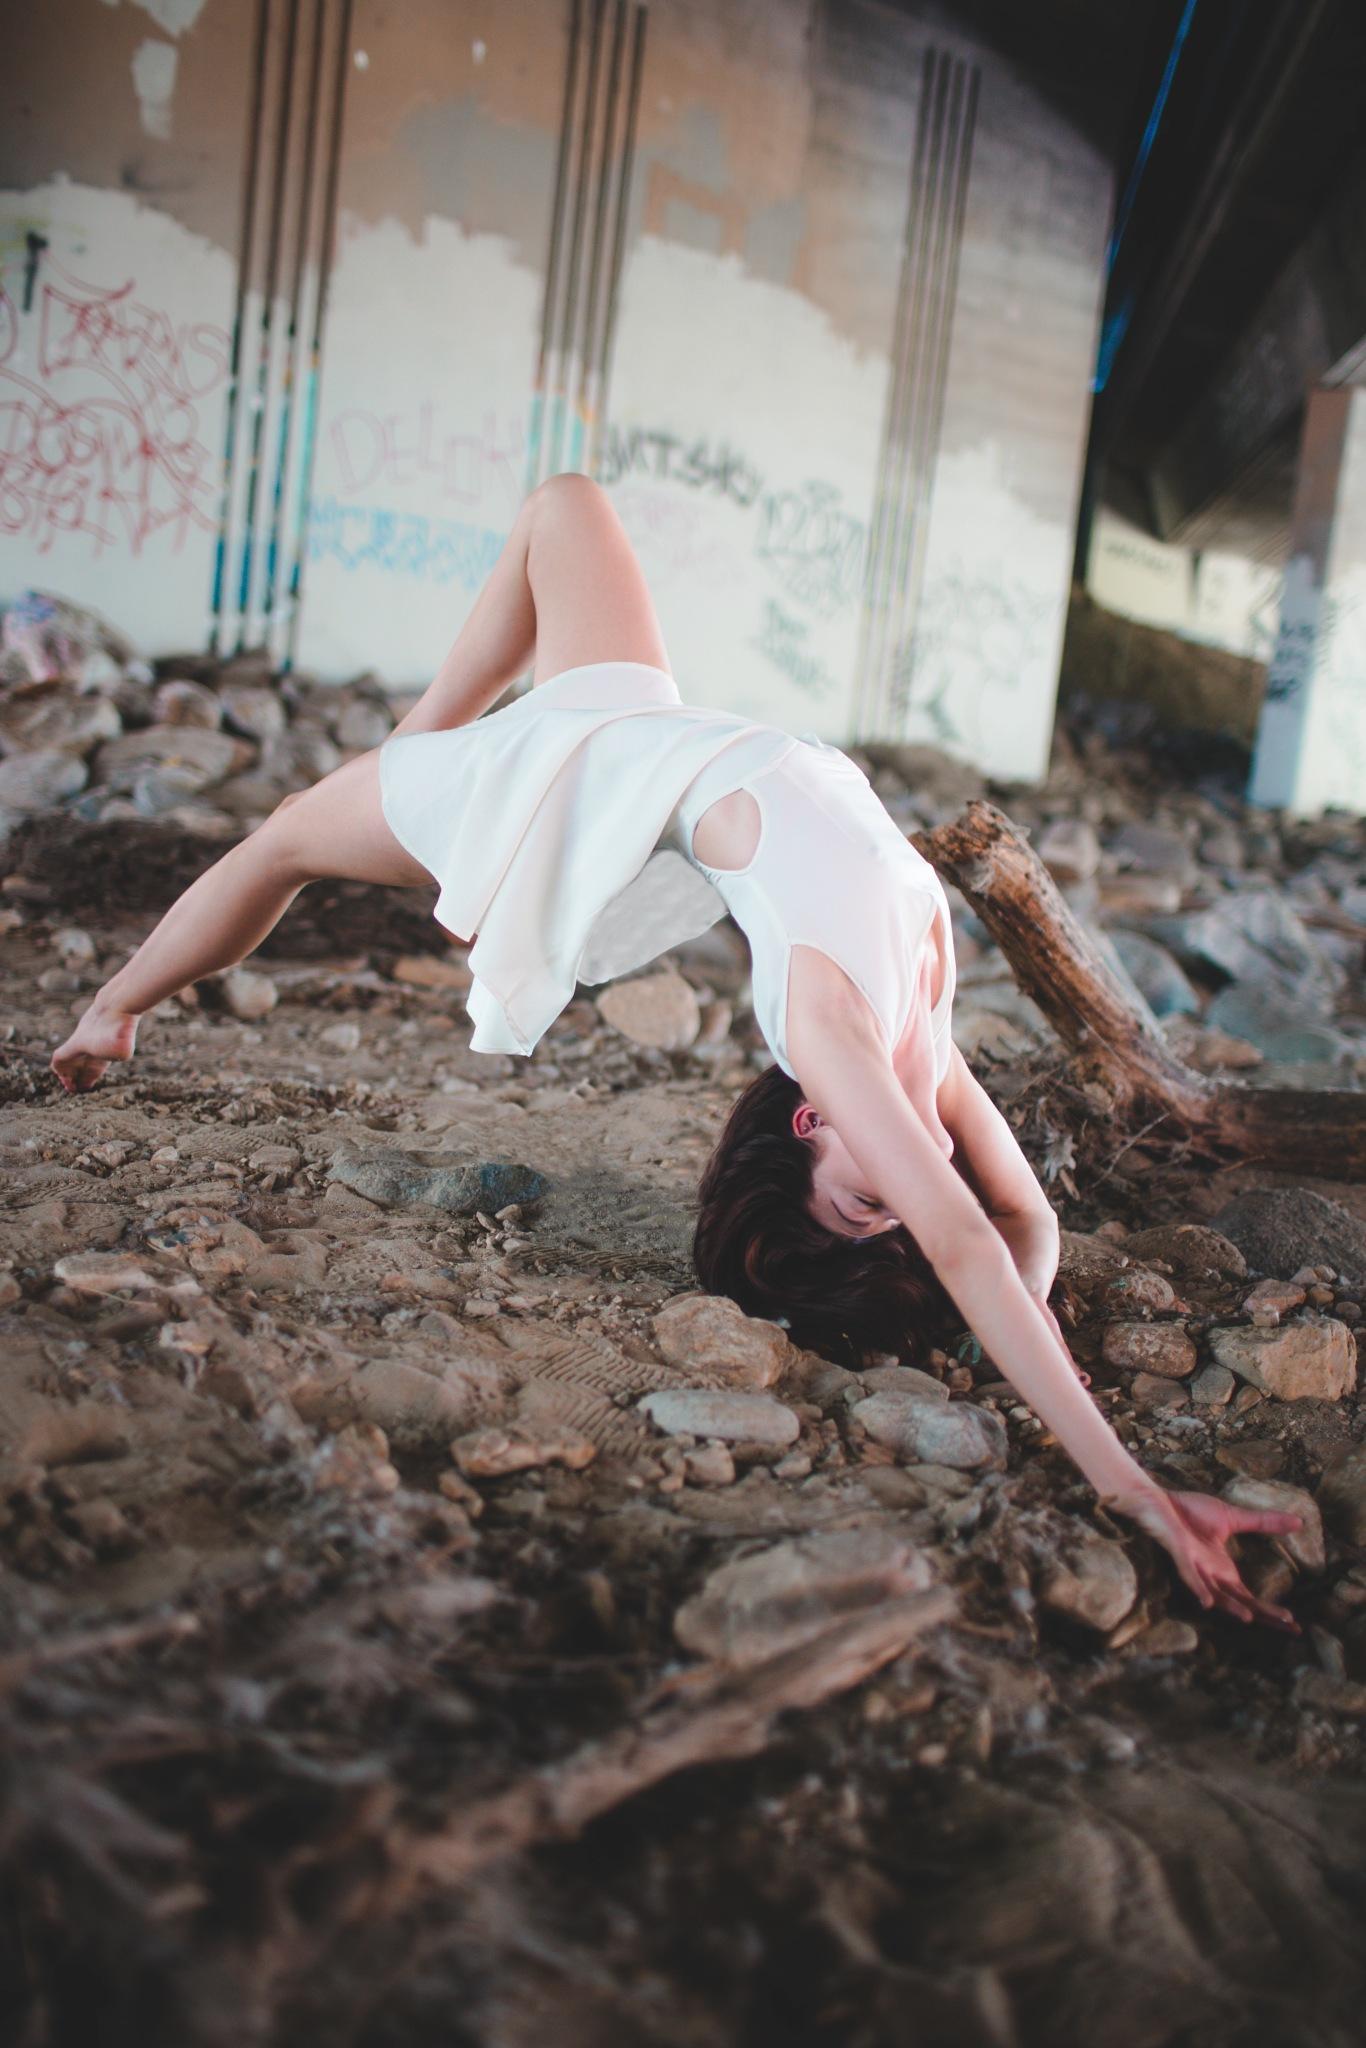 Dancer by offtheclockk